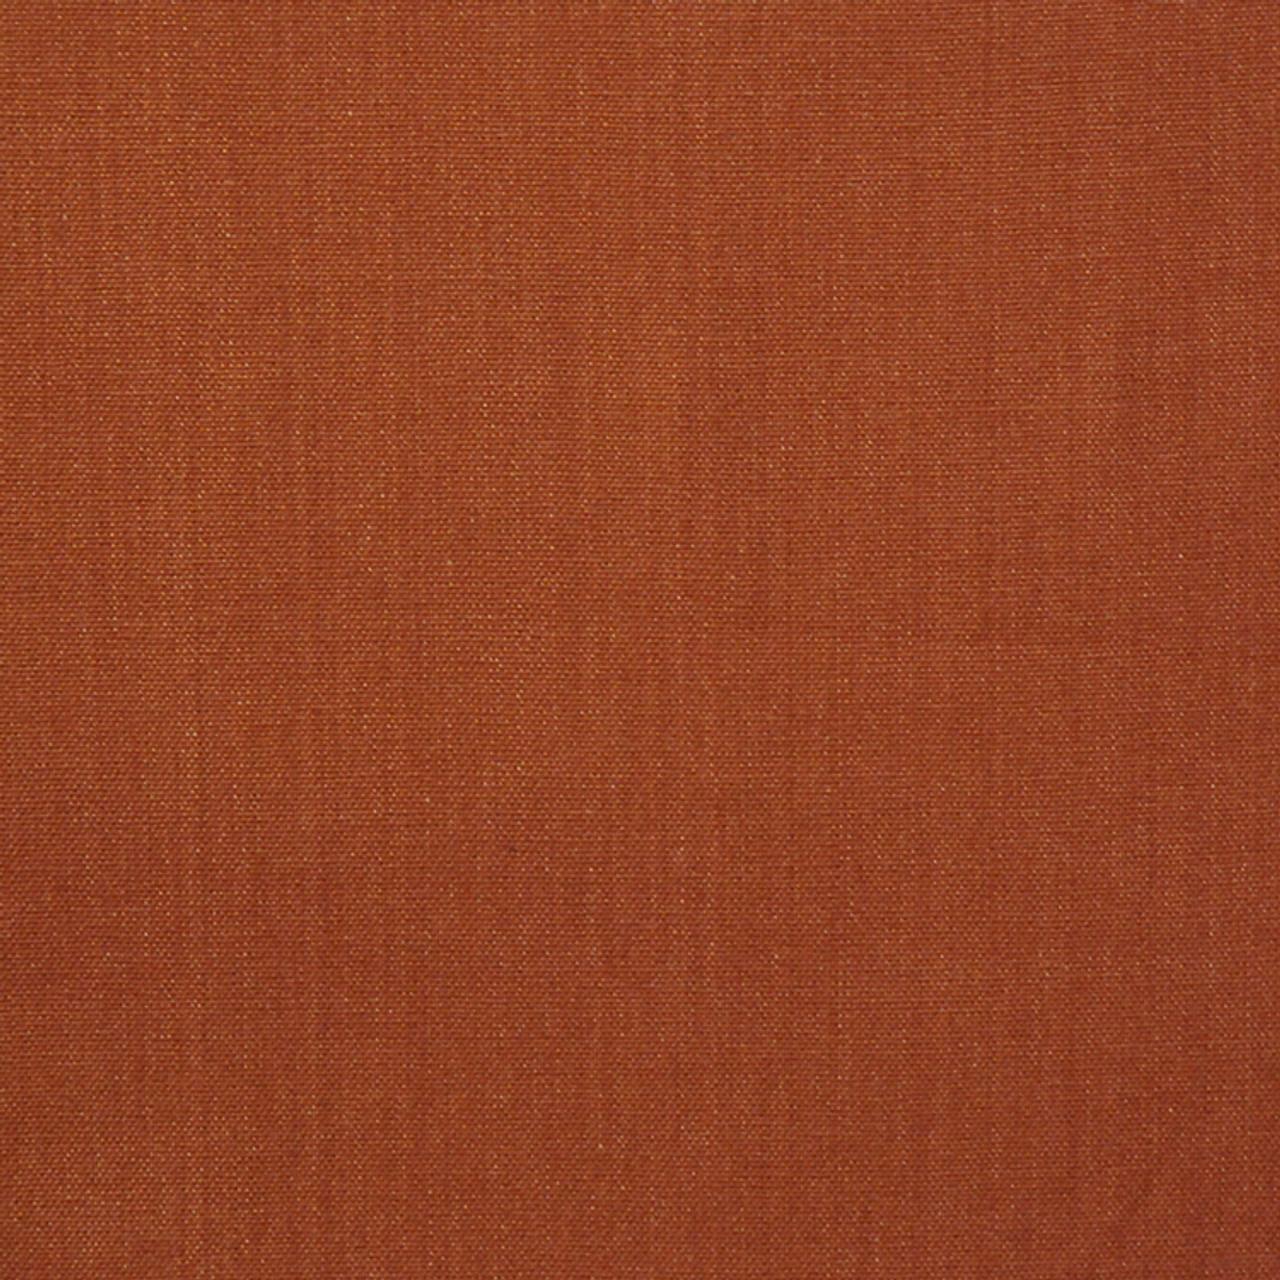 2227Cb Cinnamon by RM CoCo Fabric